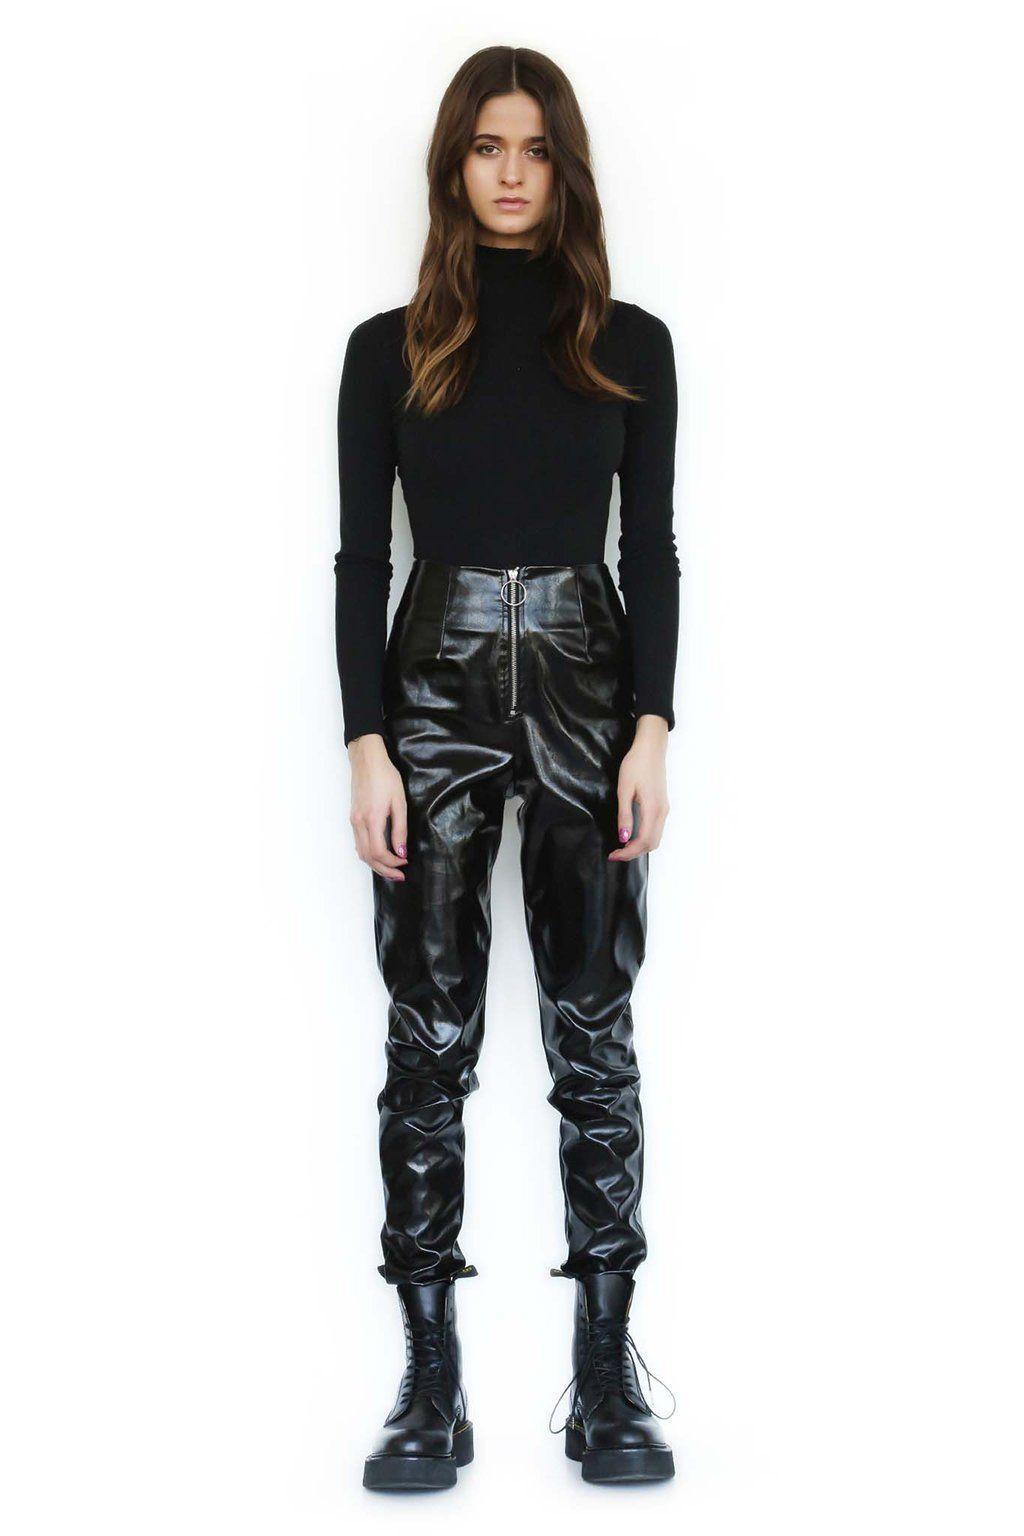 STONE BODYSUIT BLACK Alternative outfits, Fashion